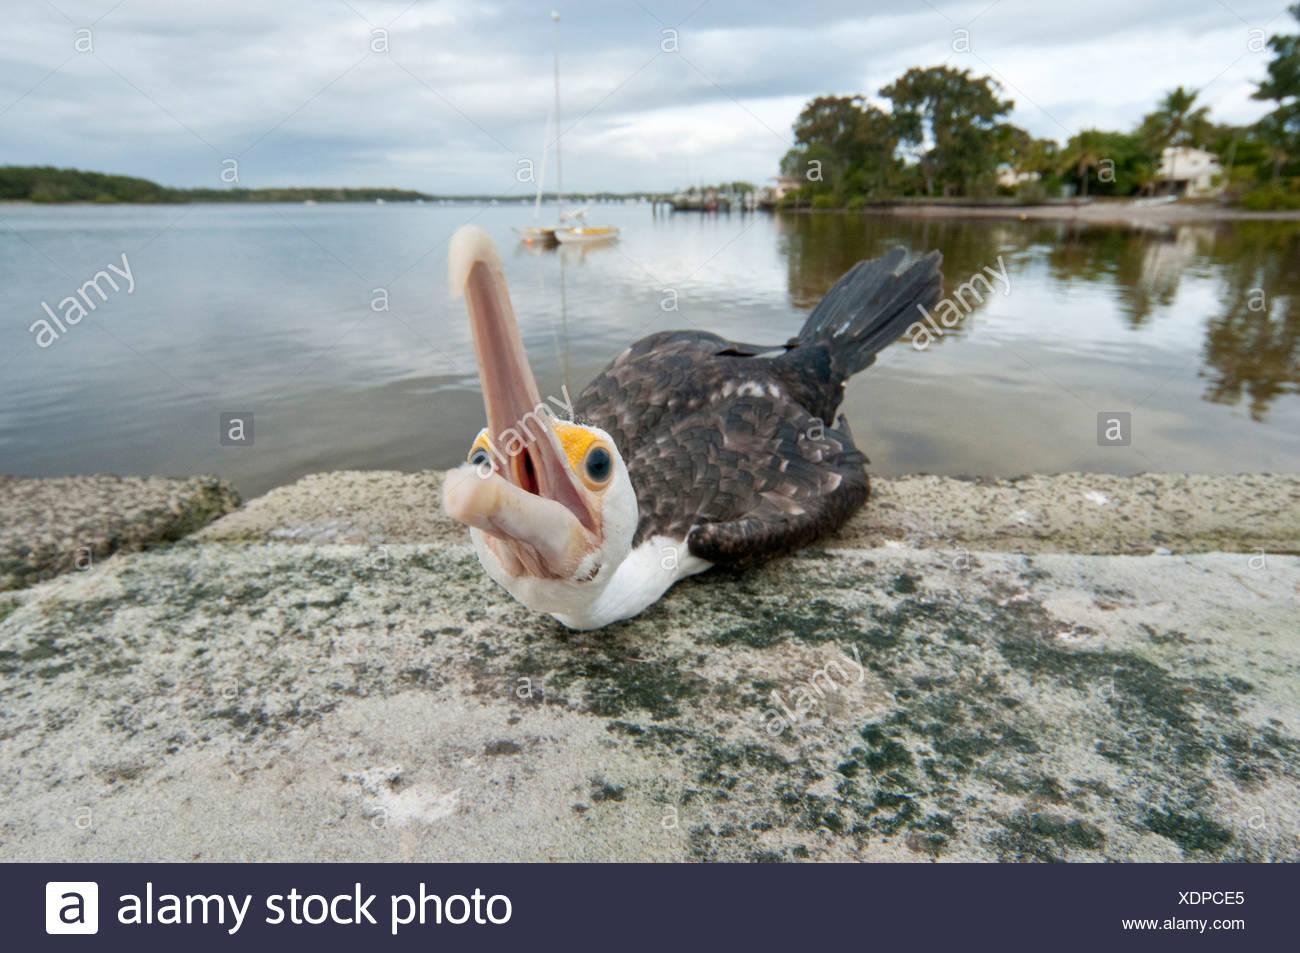 Pied Cormorant, Pied Shag (Phalacrocorax varius), begging, Australia, Queensland, Tin Can Bay - Stock Image